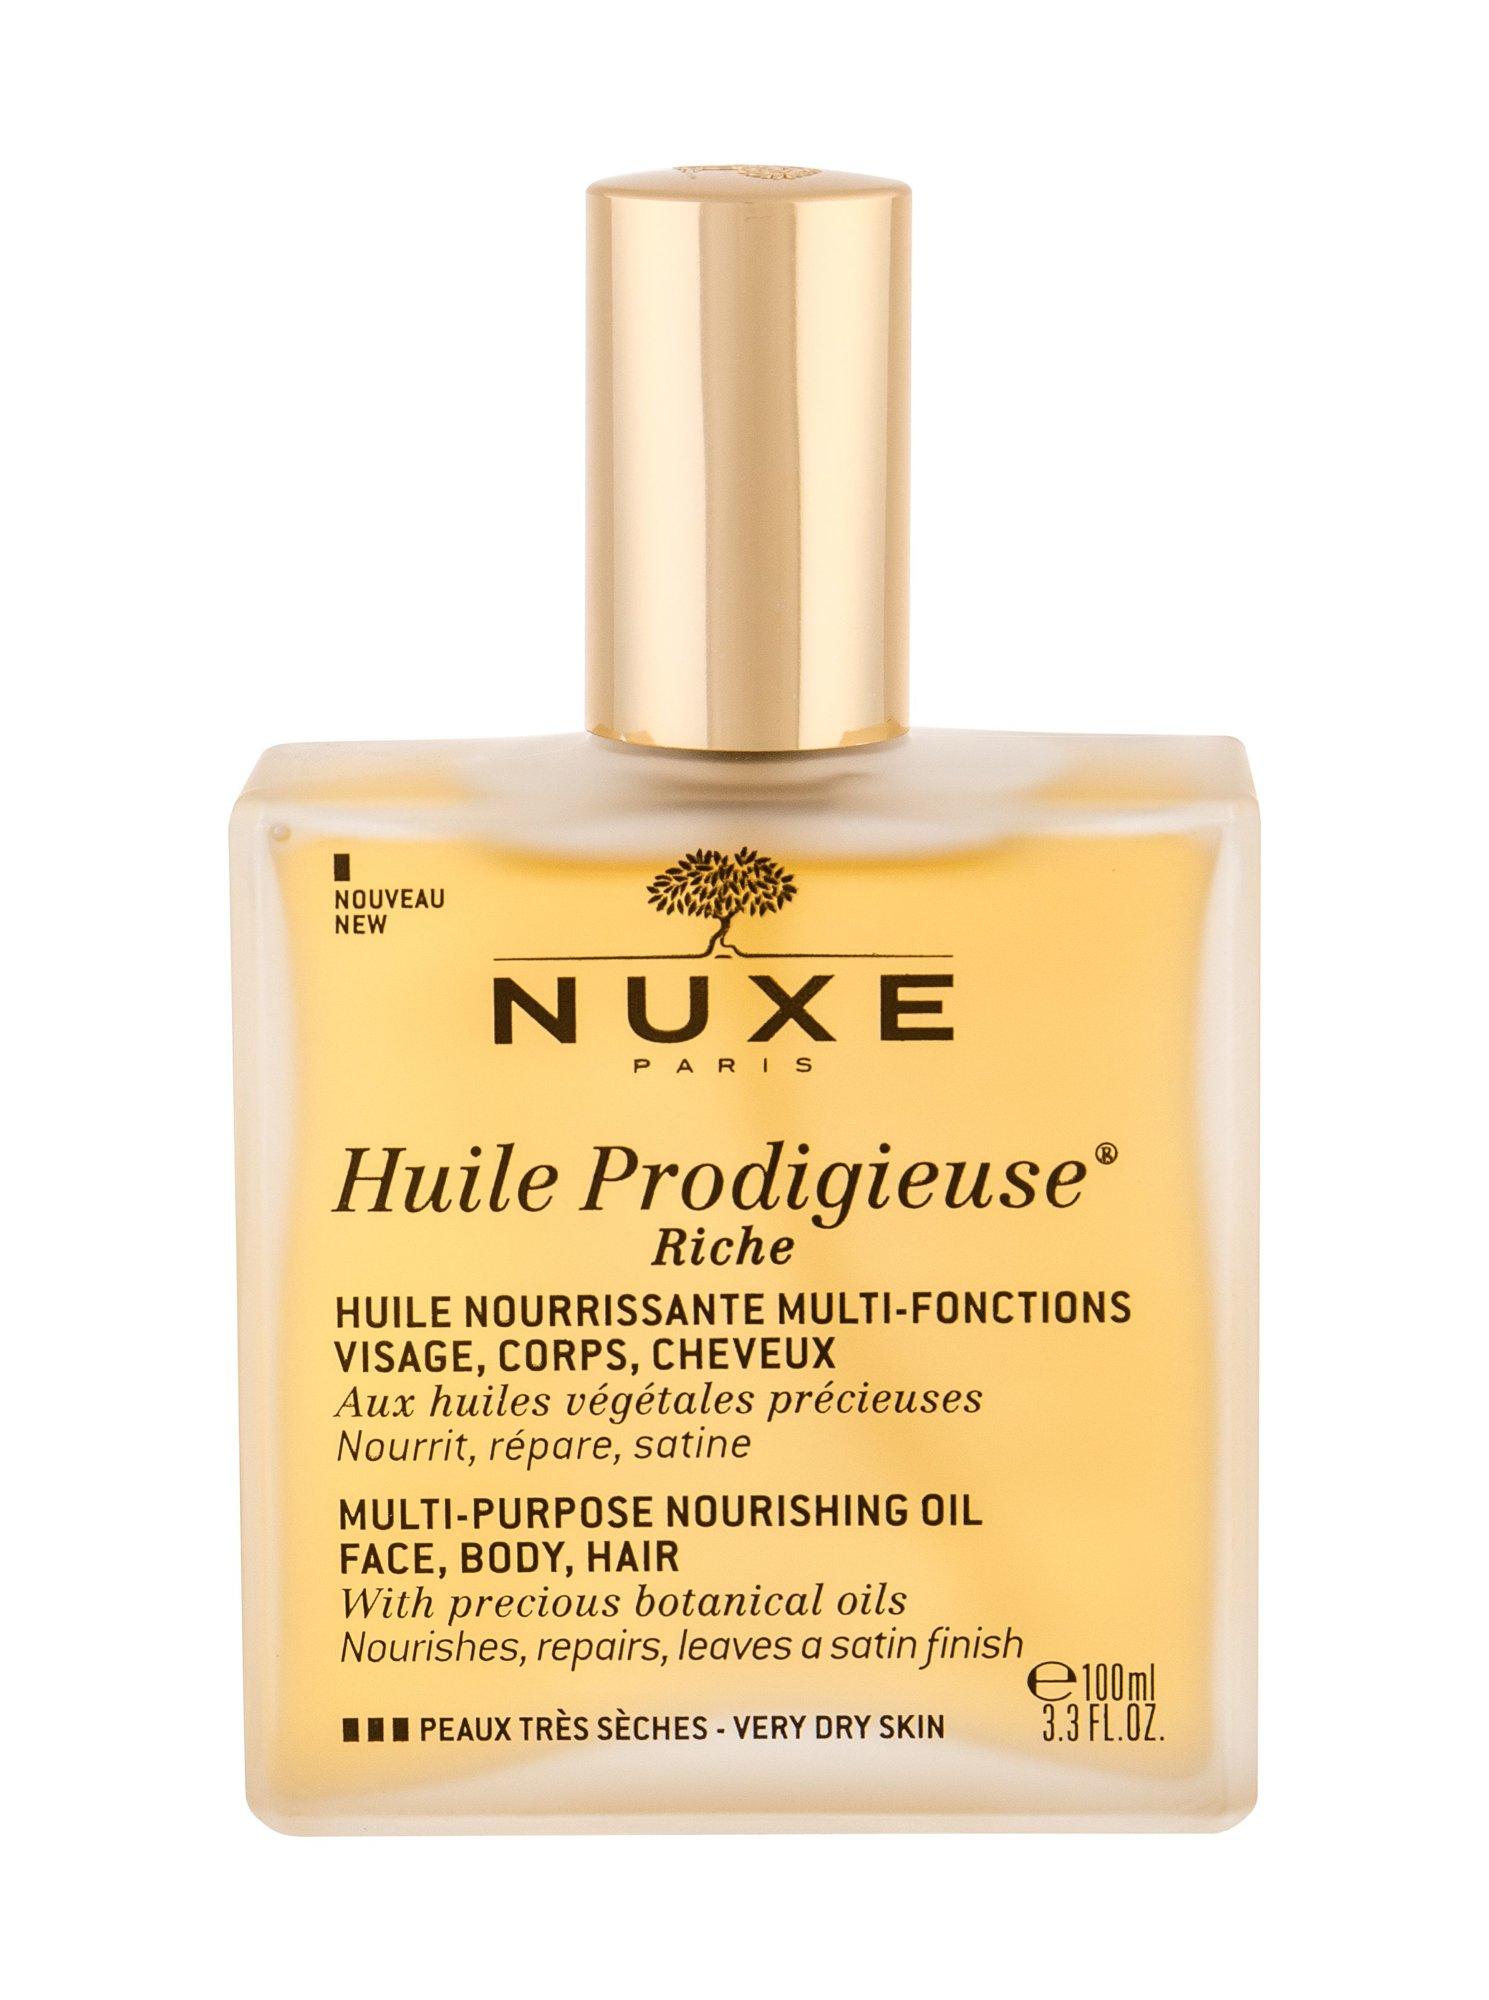 NUXE Huile Prodigieuse Body Oil 100ml